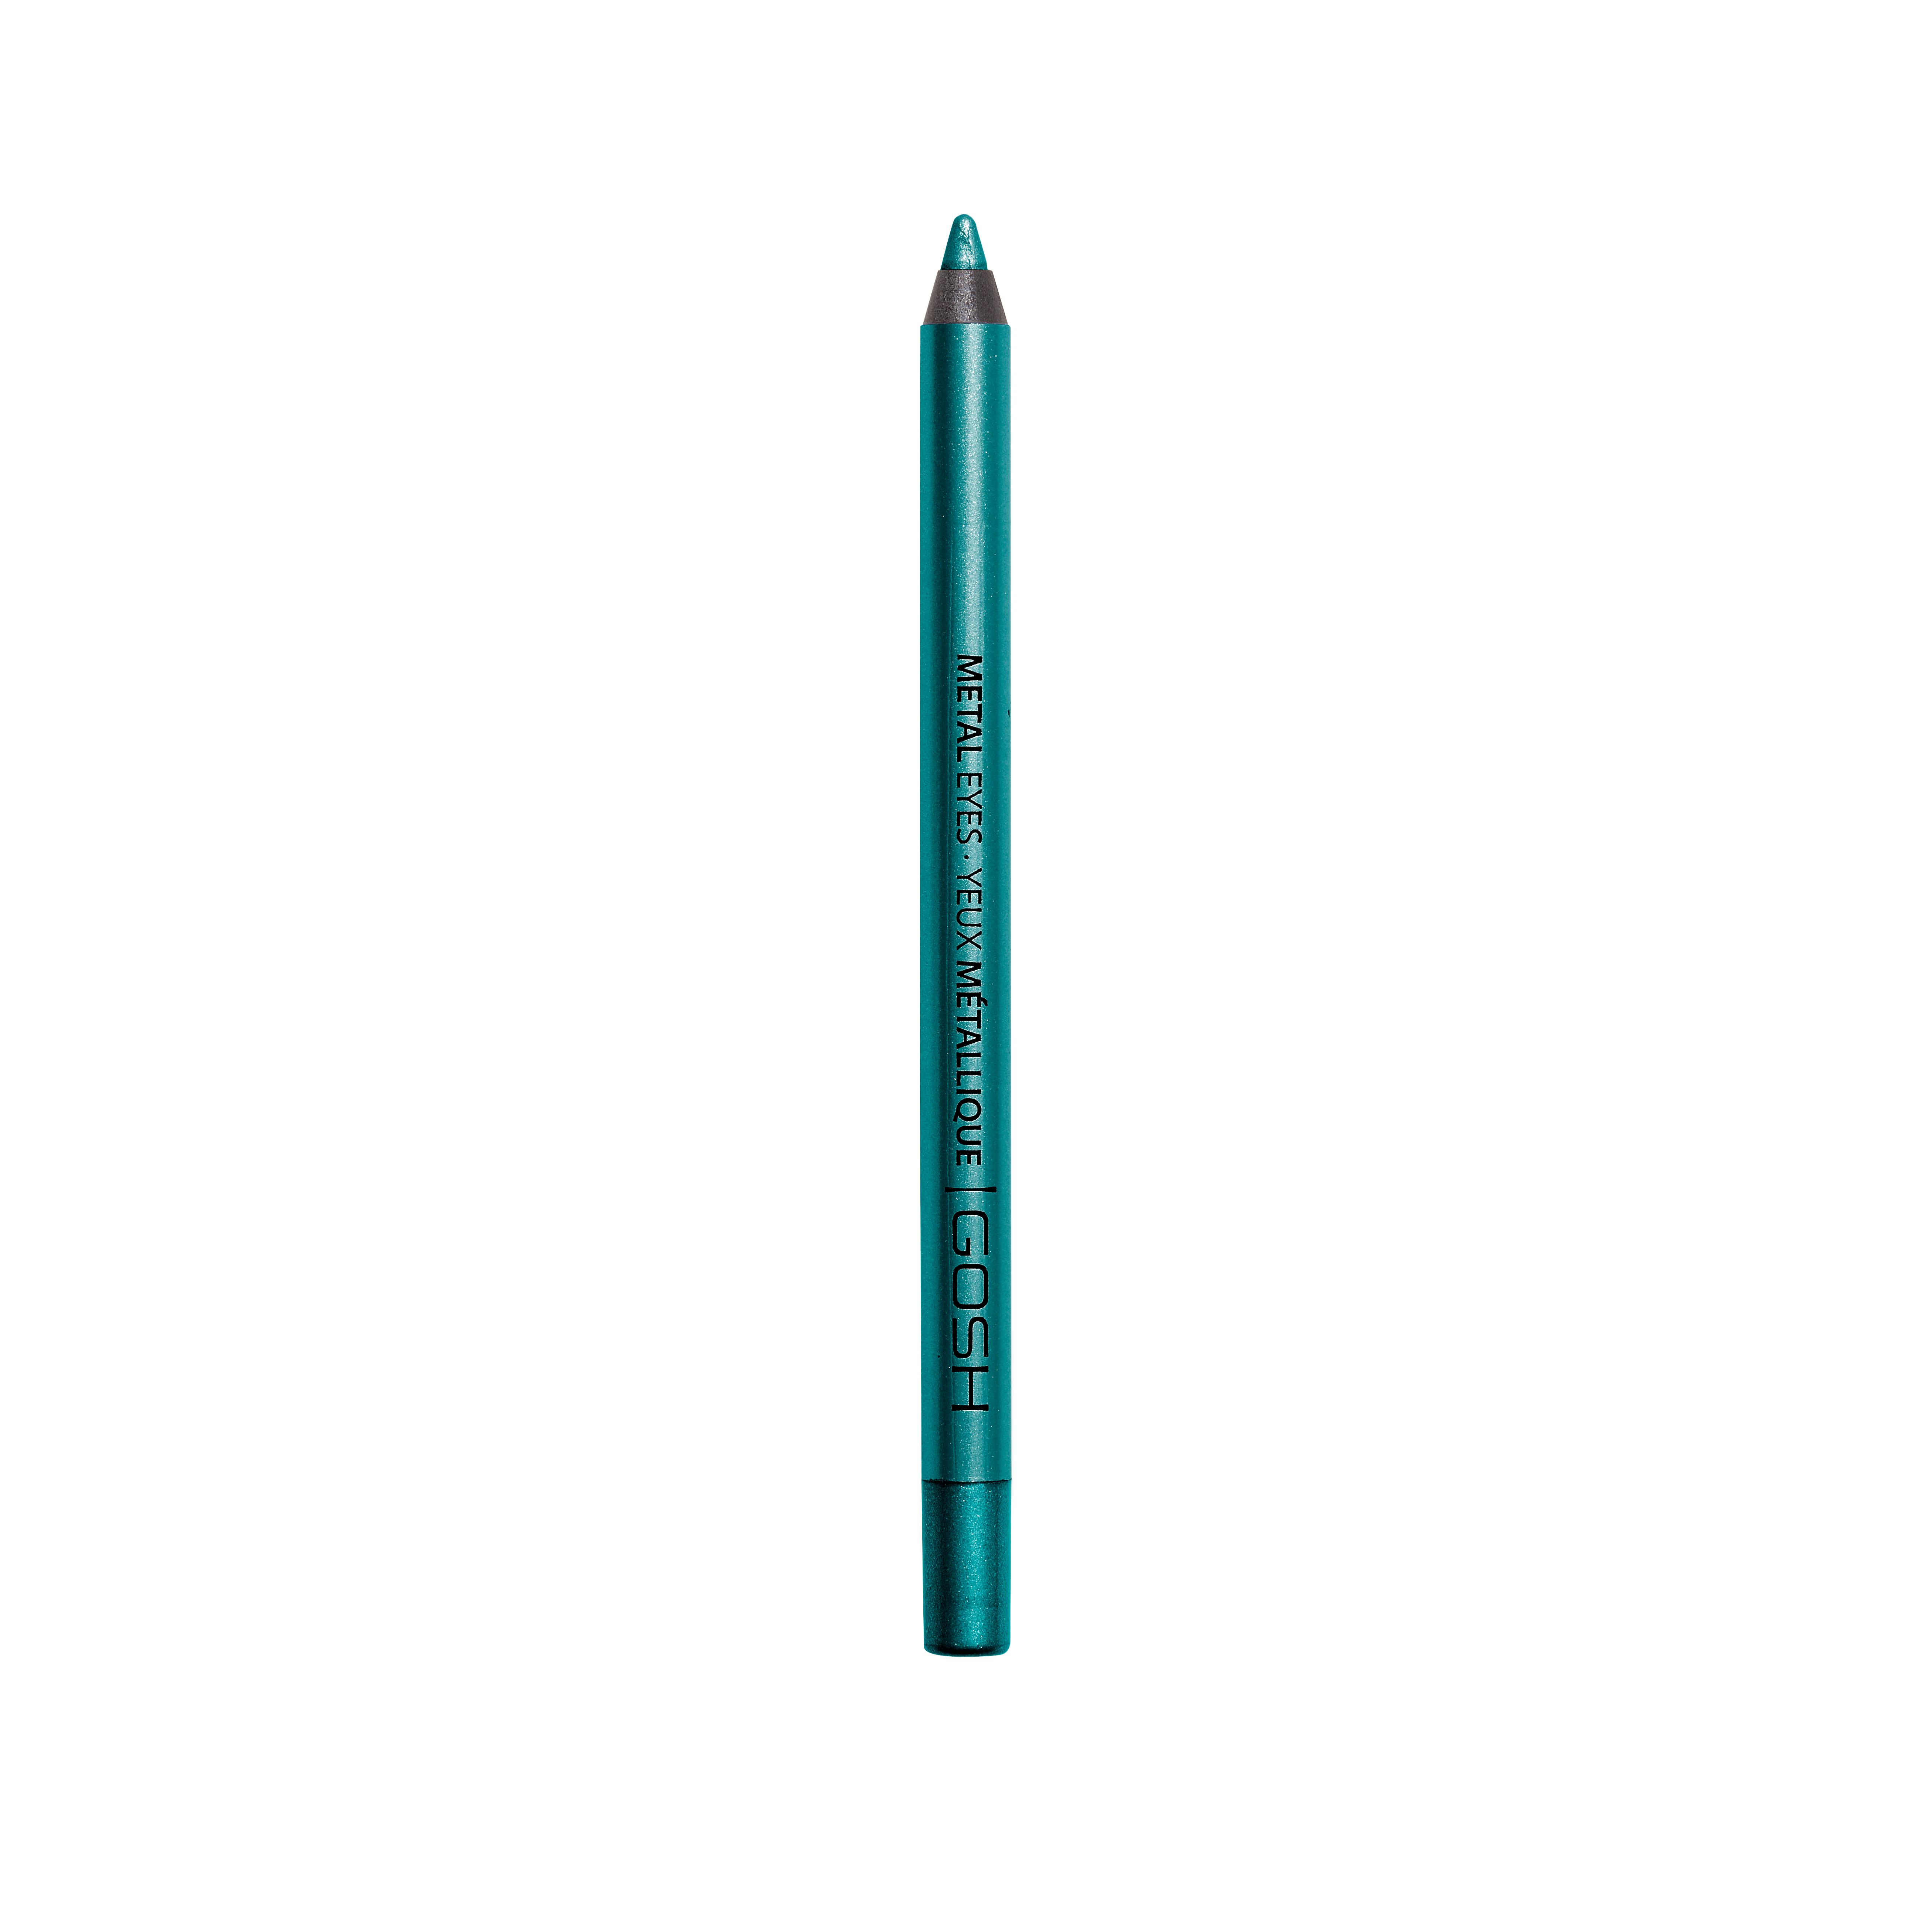 GOSH Copenhagen - Metal Eyes Eyeliner - 005 Turquoise